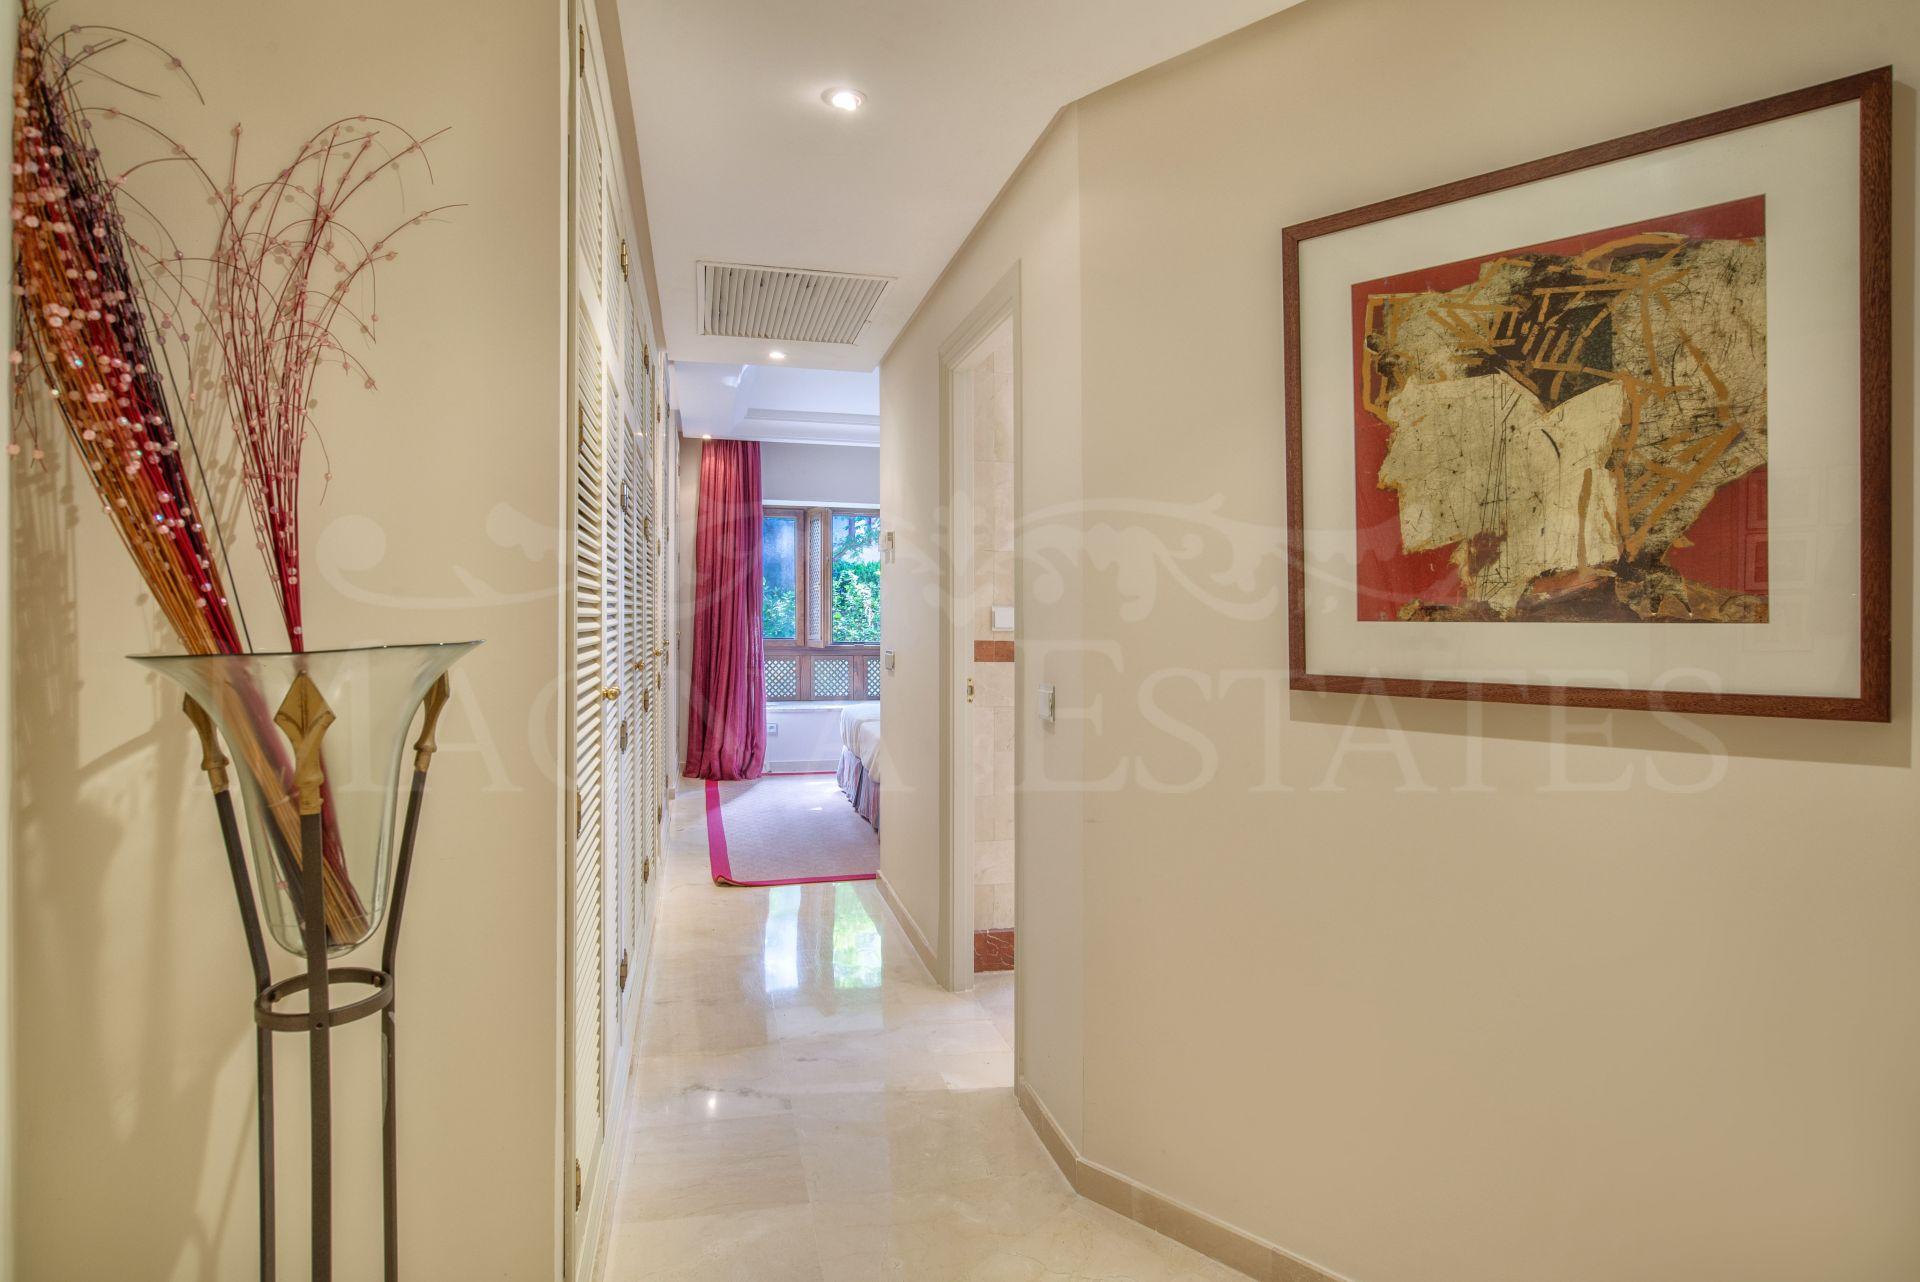 Ground floor apartment with 4 bedrooms, in Ventura del Mar, Puerto Banús